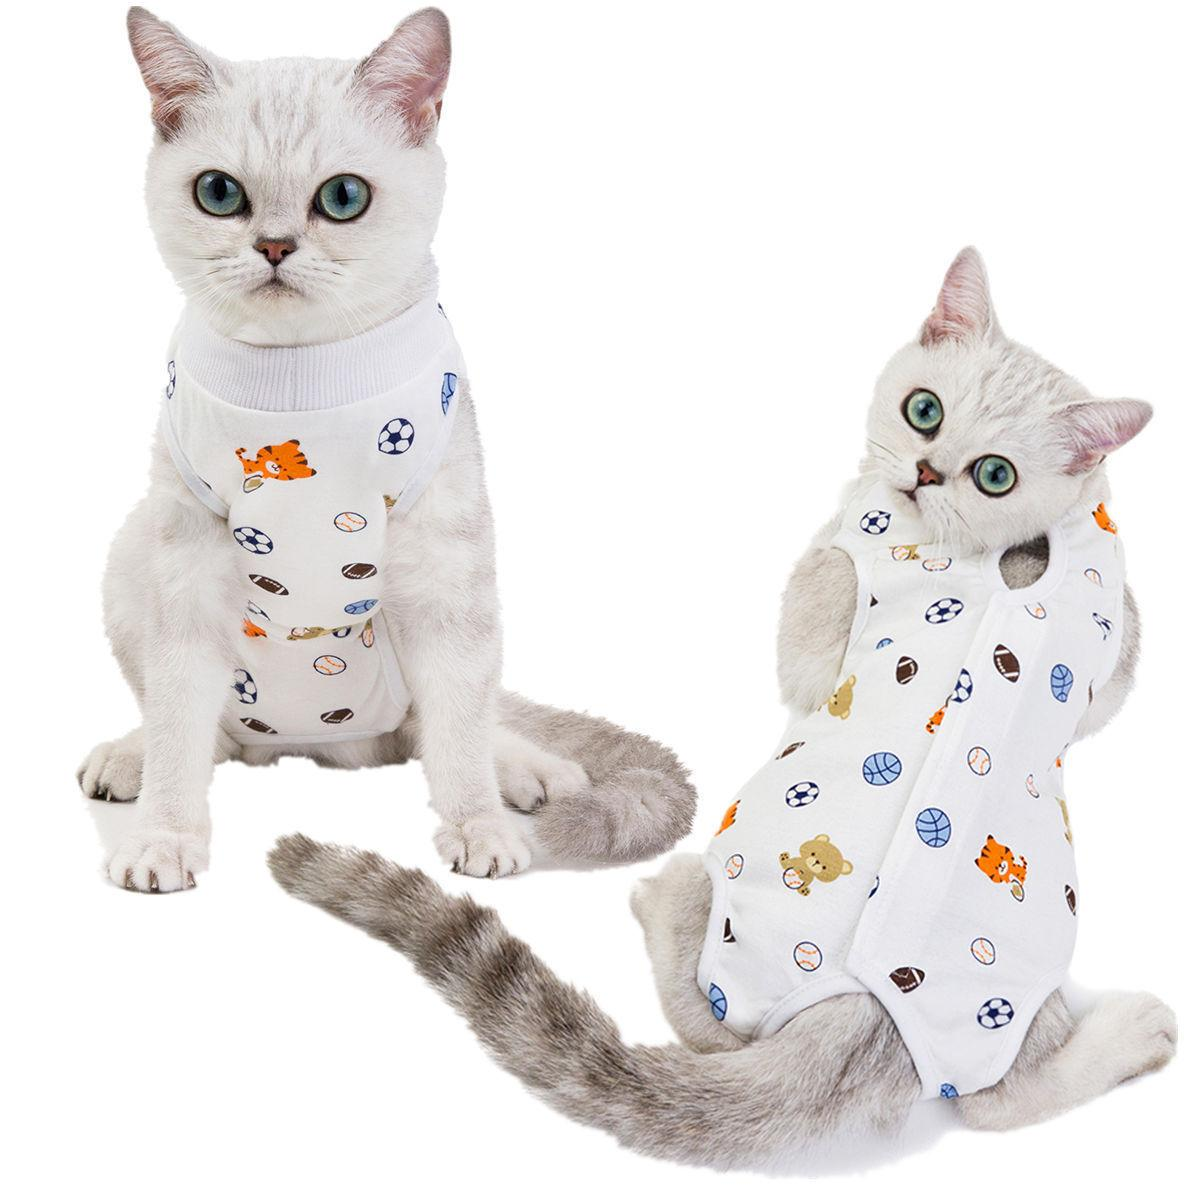 Sublimación Reflector en blanco Nylon Chaleco para perros de mascotas Ropa de malla transpirable ajustable Camisa de moda creativa Camisa de verano TUXEDO PET DOG Suppli {Categoría} WTPY